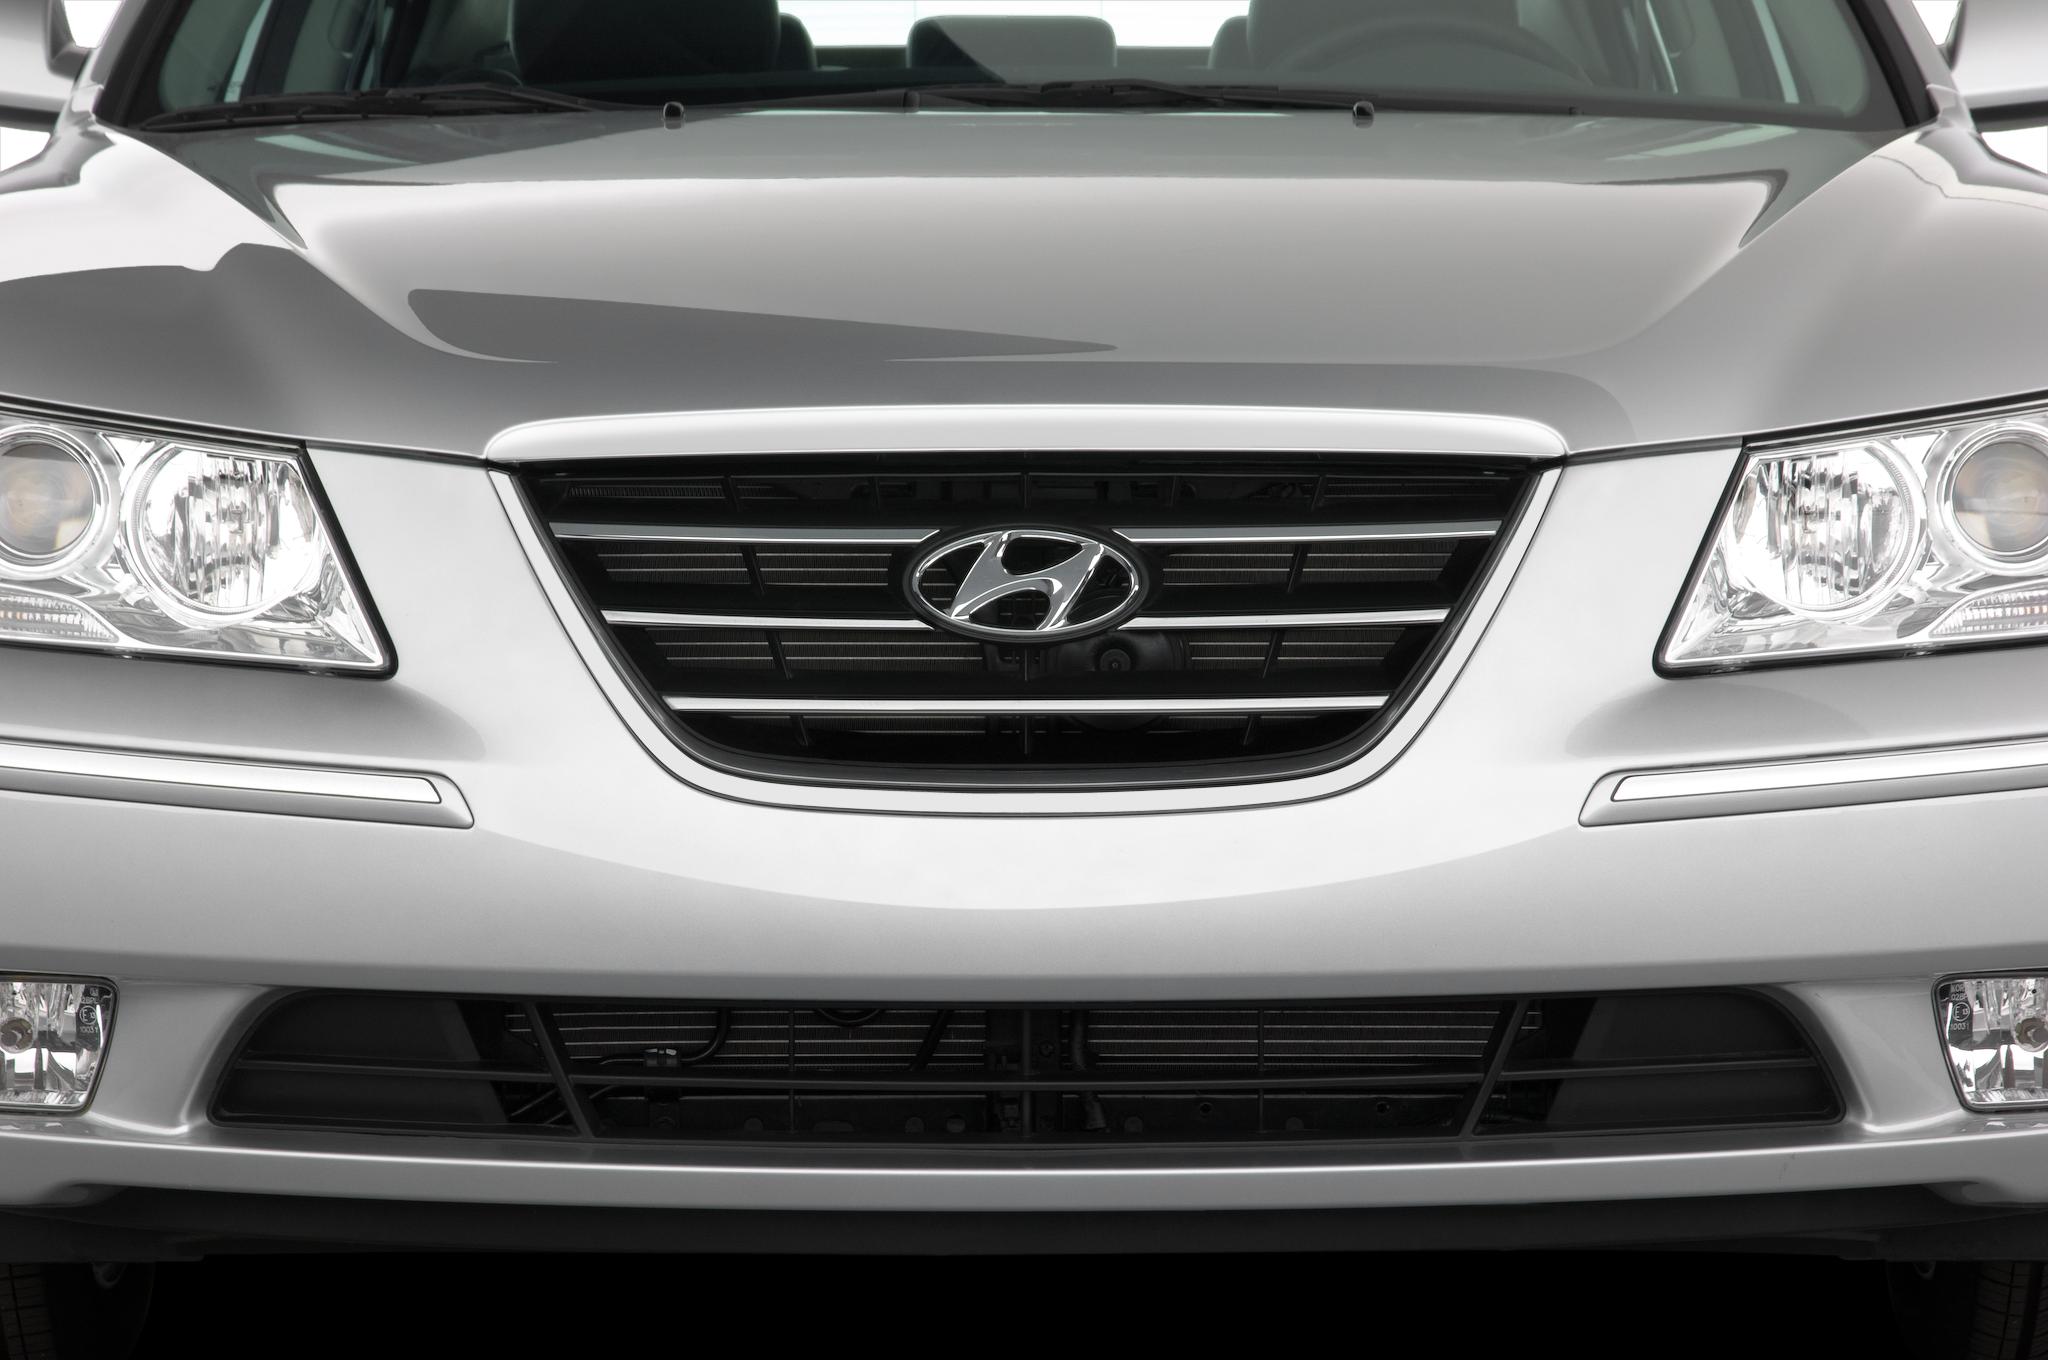 2010 Hyundai Sonata Se Midsize Sedan Review Automobile 2 4 Engine Diagram 3 25